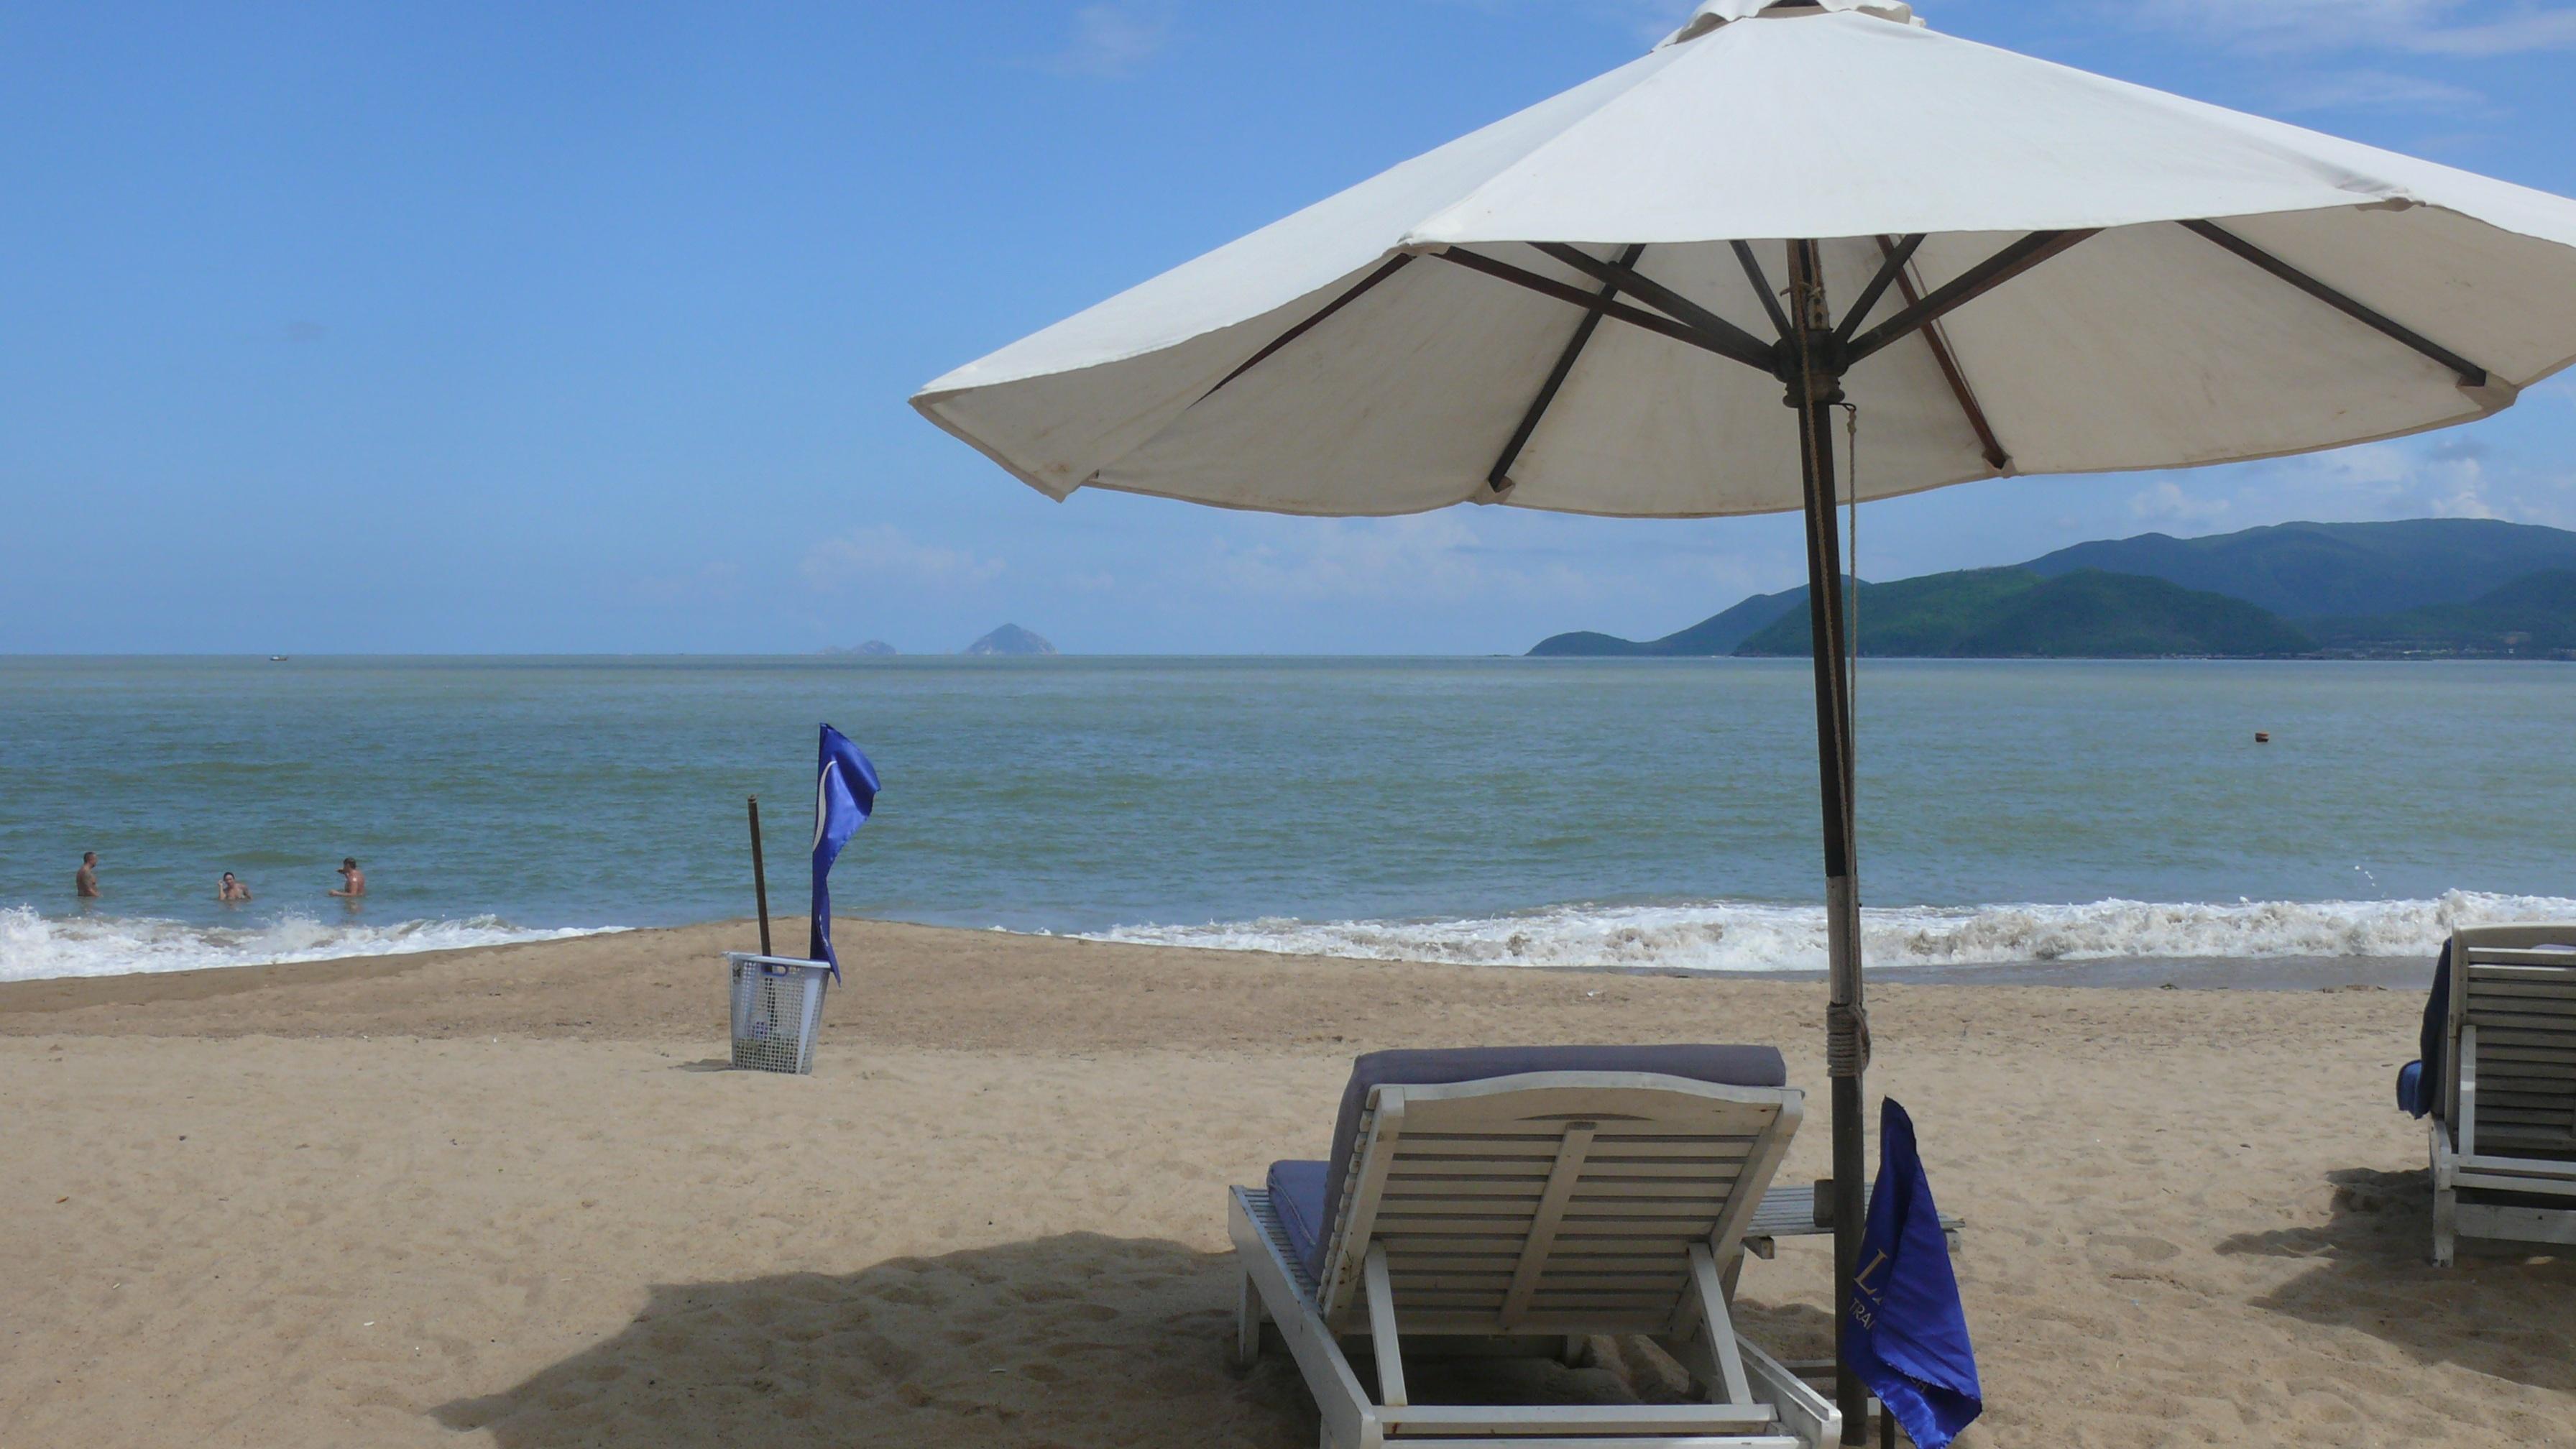 Free Images : sea, coast, ocean, wind, summer, vacation ...